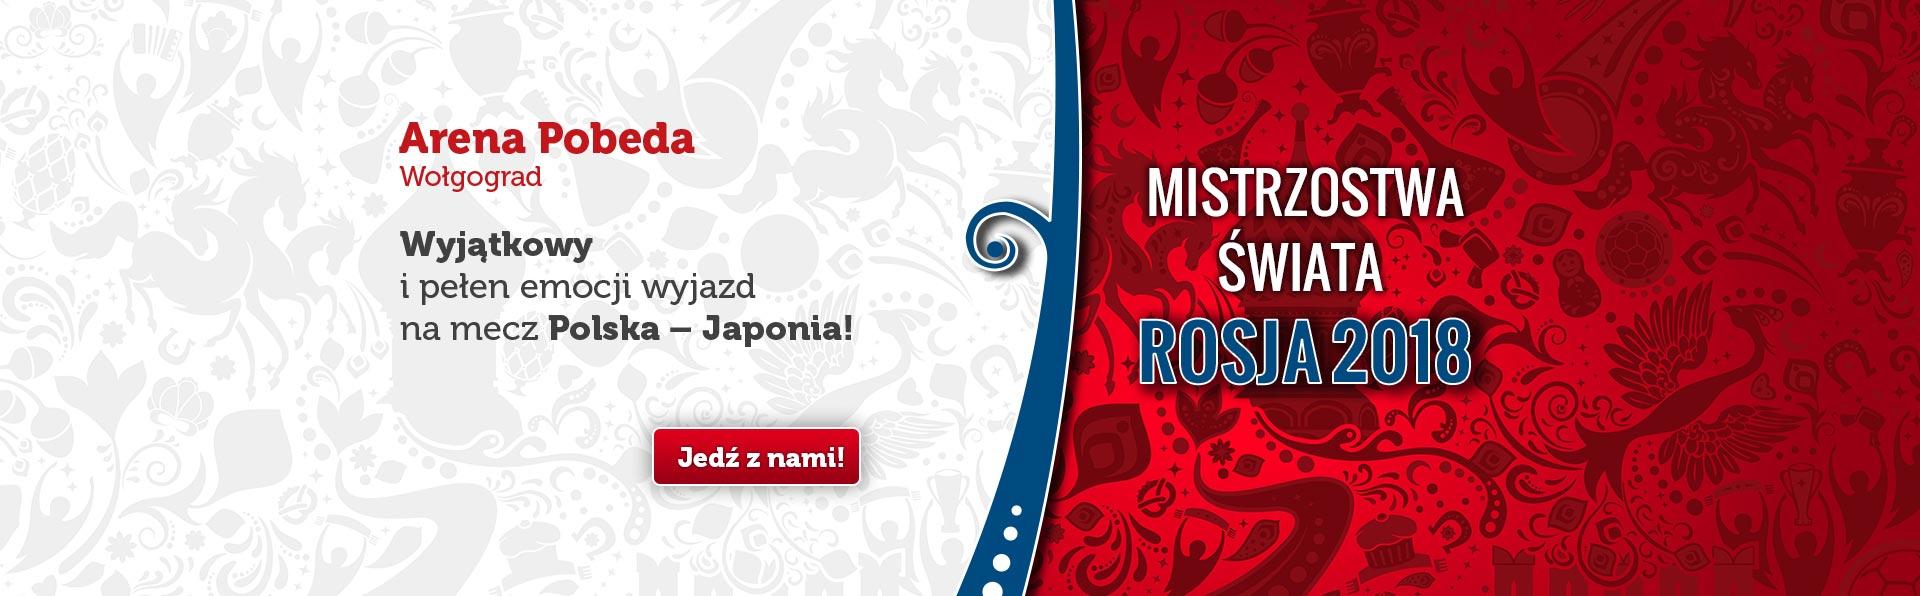 banner_rosja3